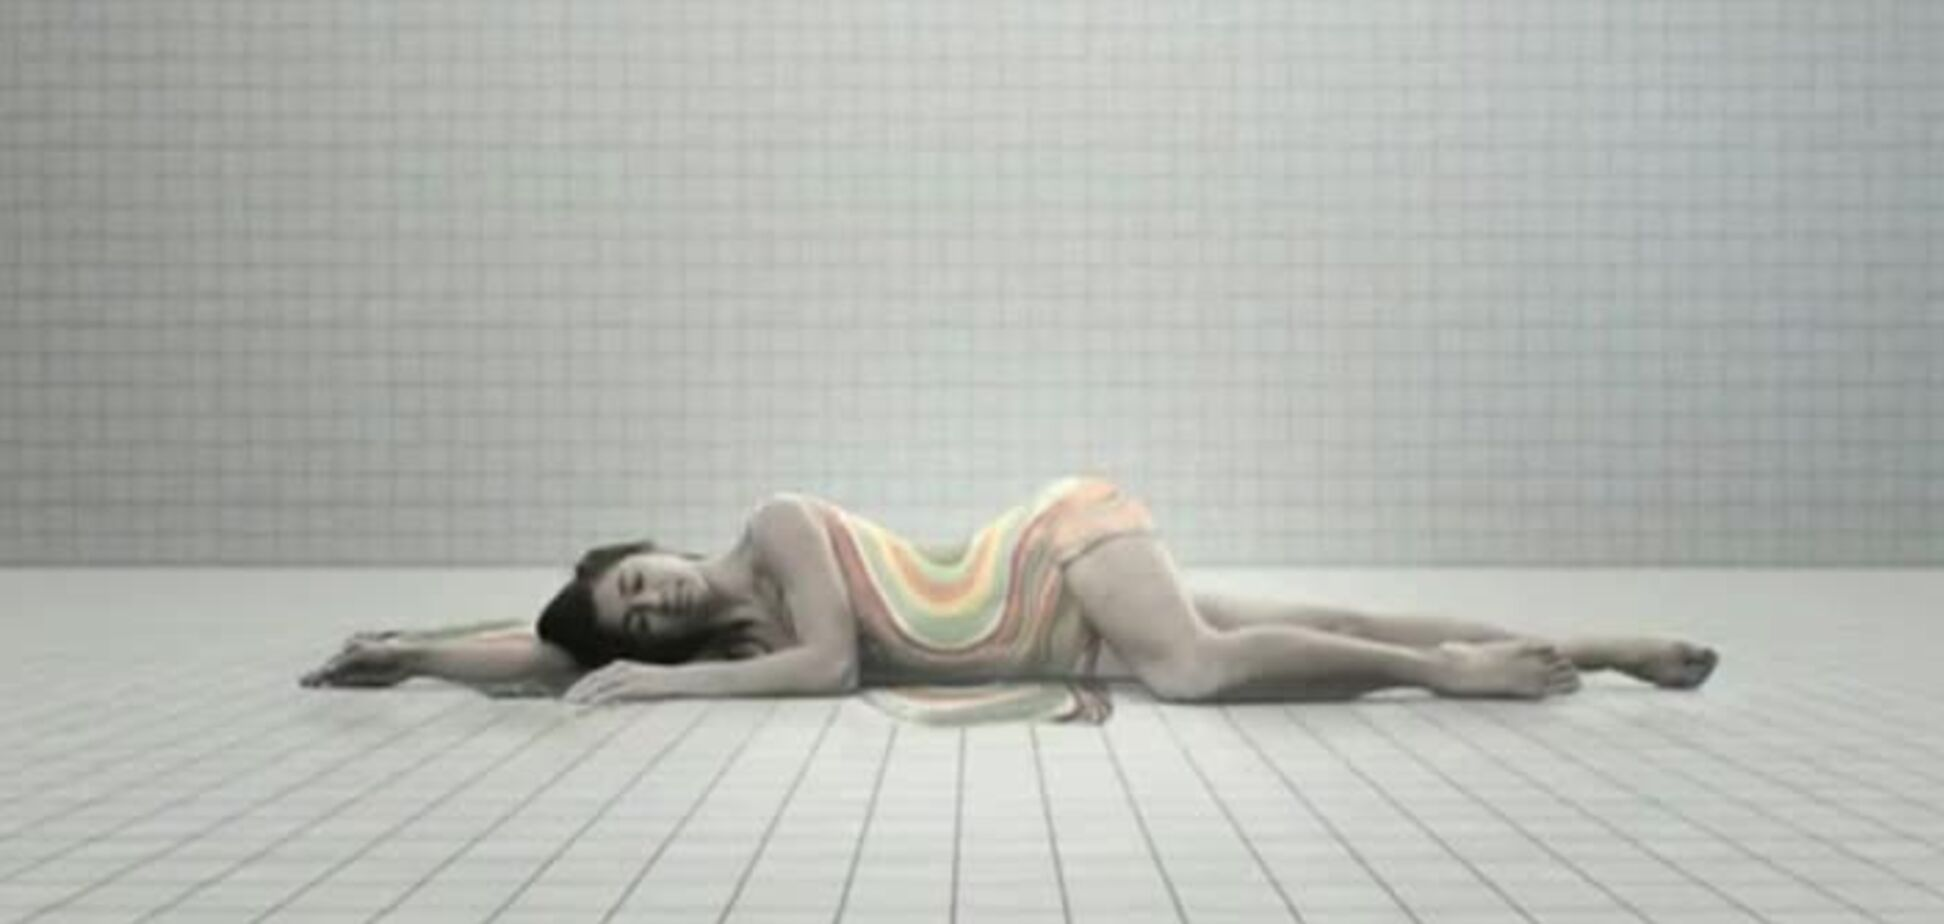 Mike Posner - Looks Like Sex